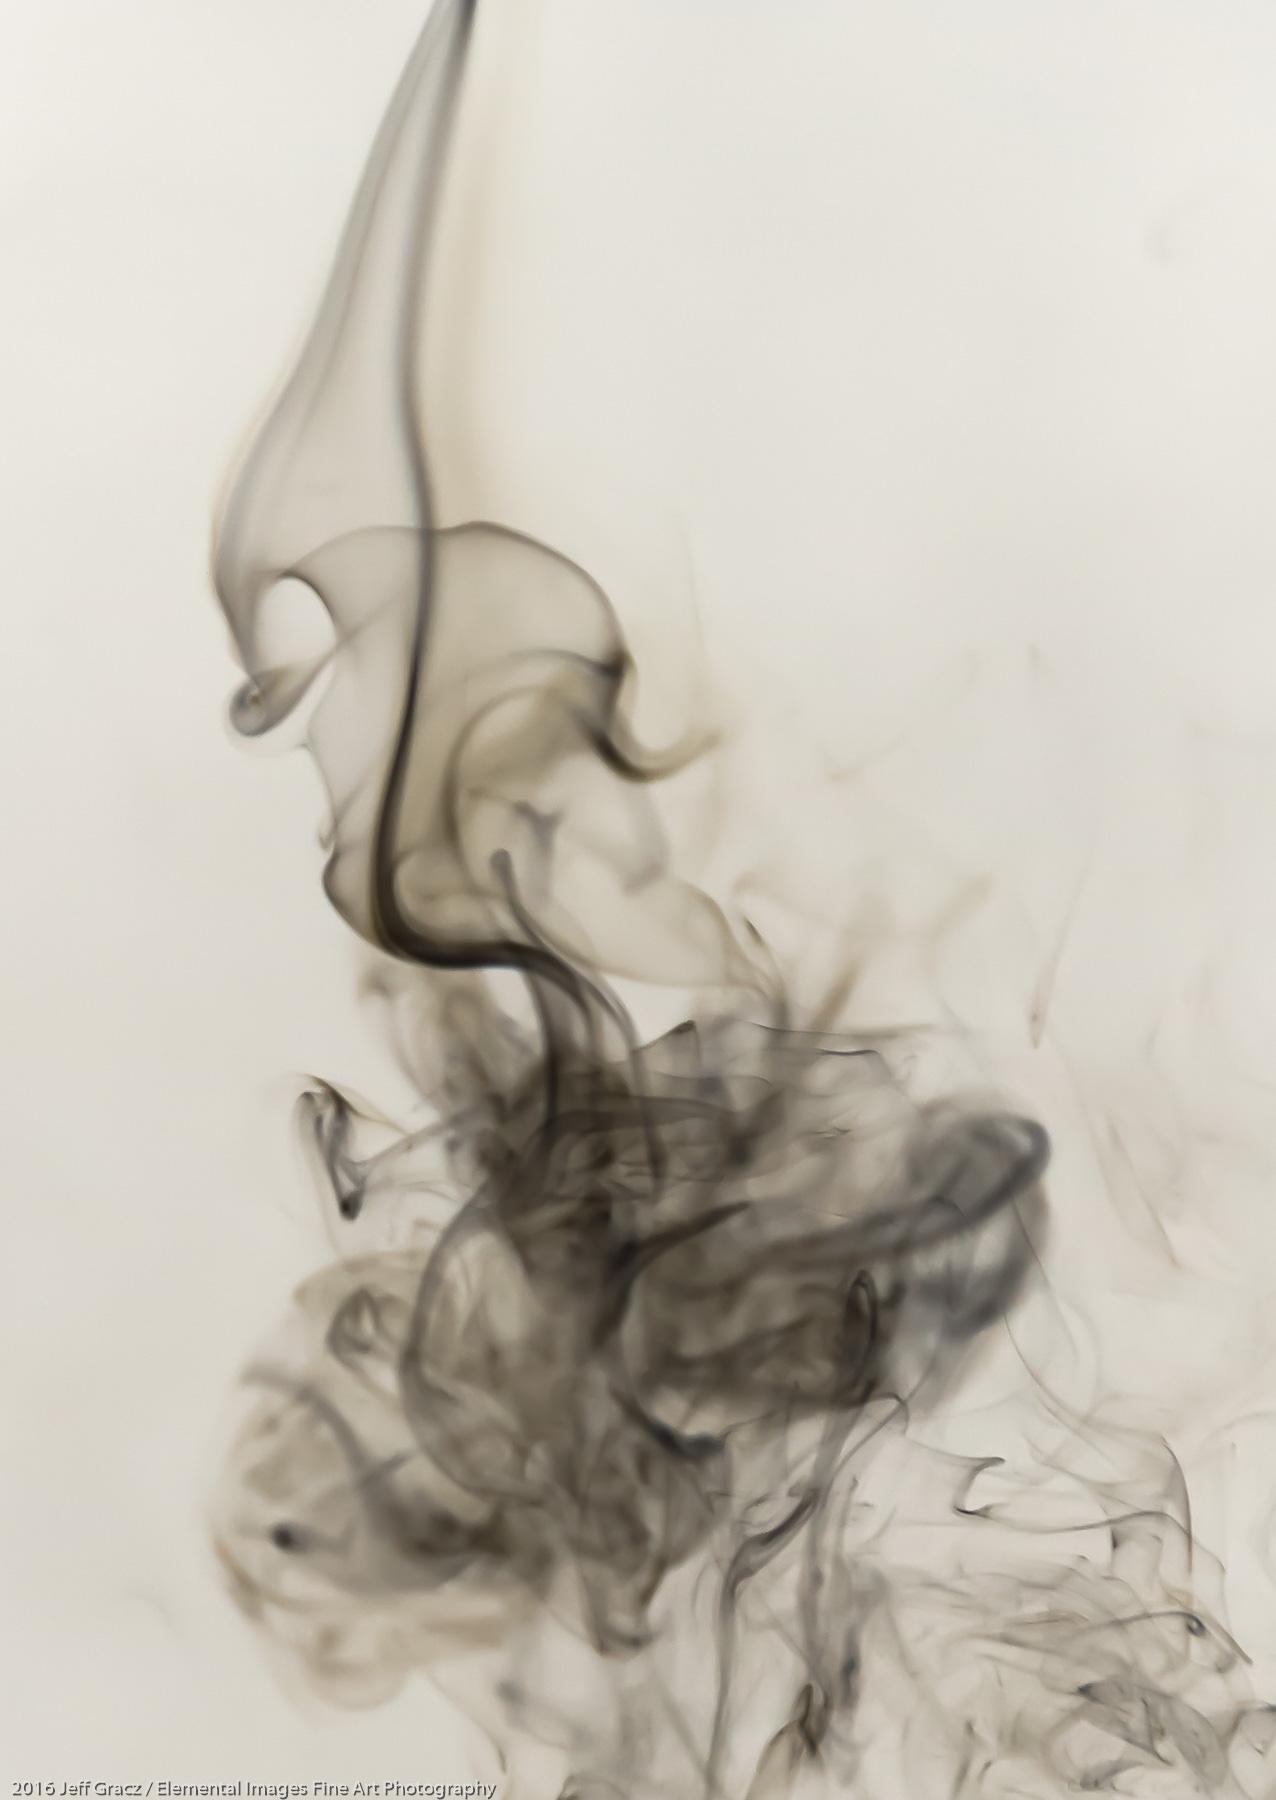 Smoke 33 | Vancouver | WA | USA - © 2016 Jeff Gracz / Elemental Images Fine Art Photography - All Rights Reserved Worldwide